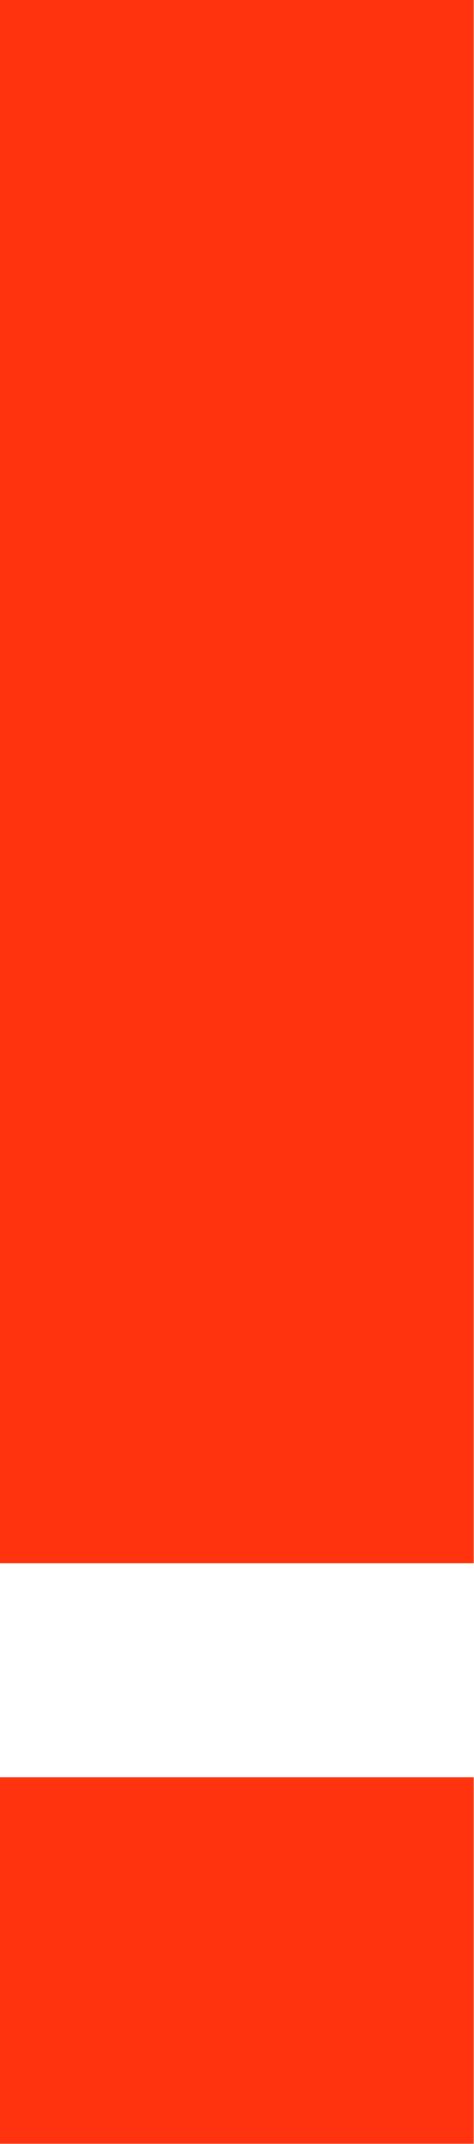 isidor exclamation mark orange jpg 300ppi.jpg